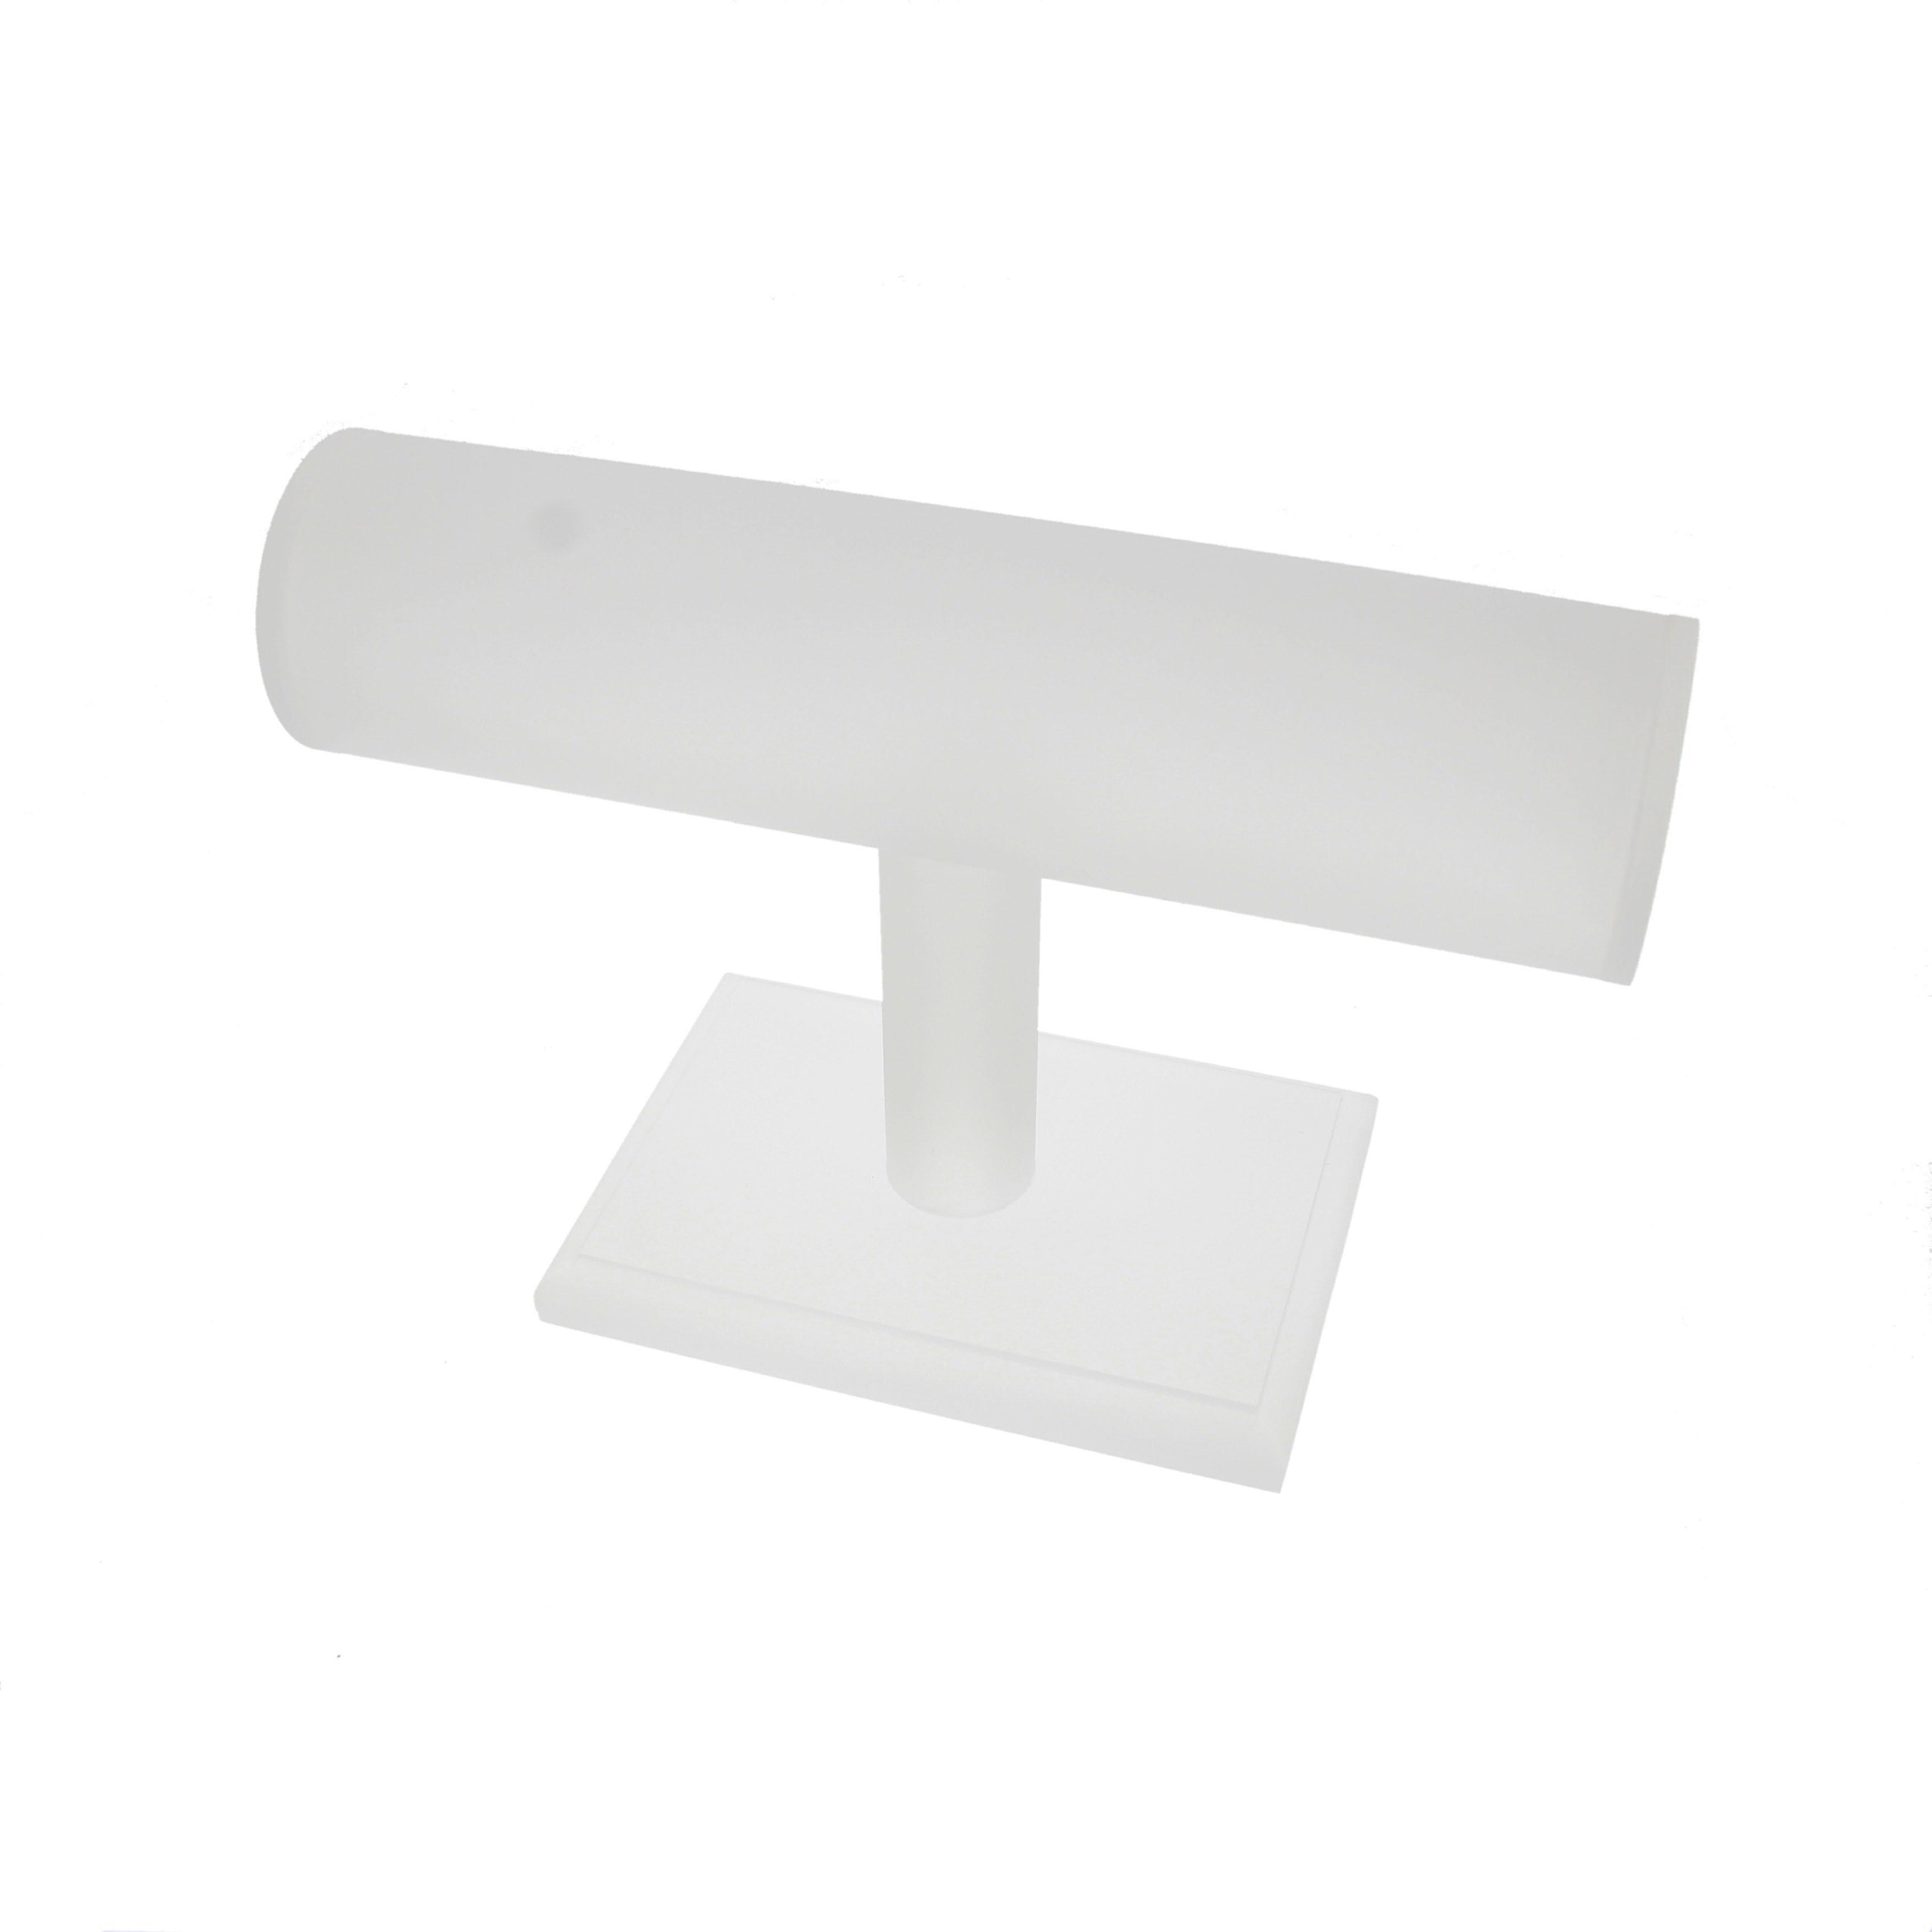 Подставка из пластика под браслет (10х7х10,5) MJ37